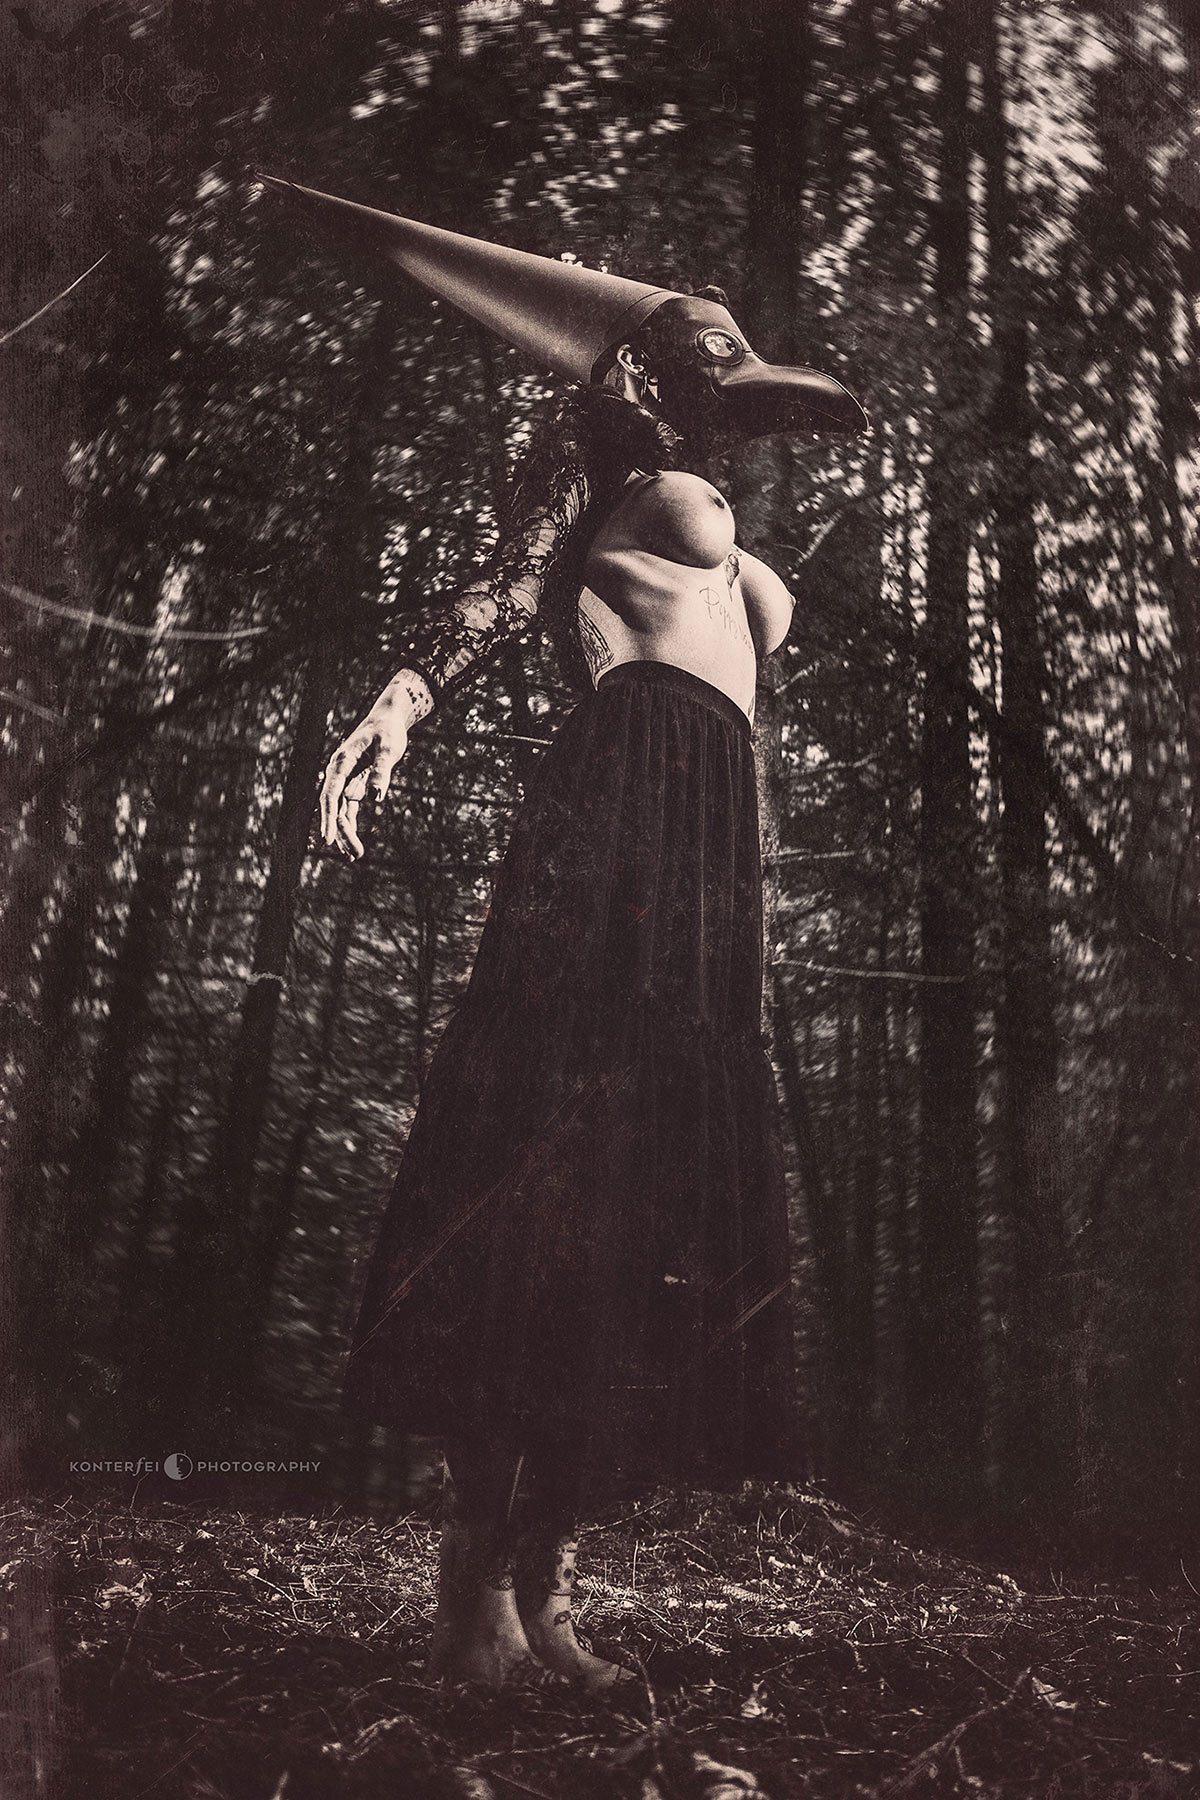 Corvax | Dark Art | Photography